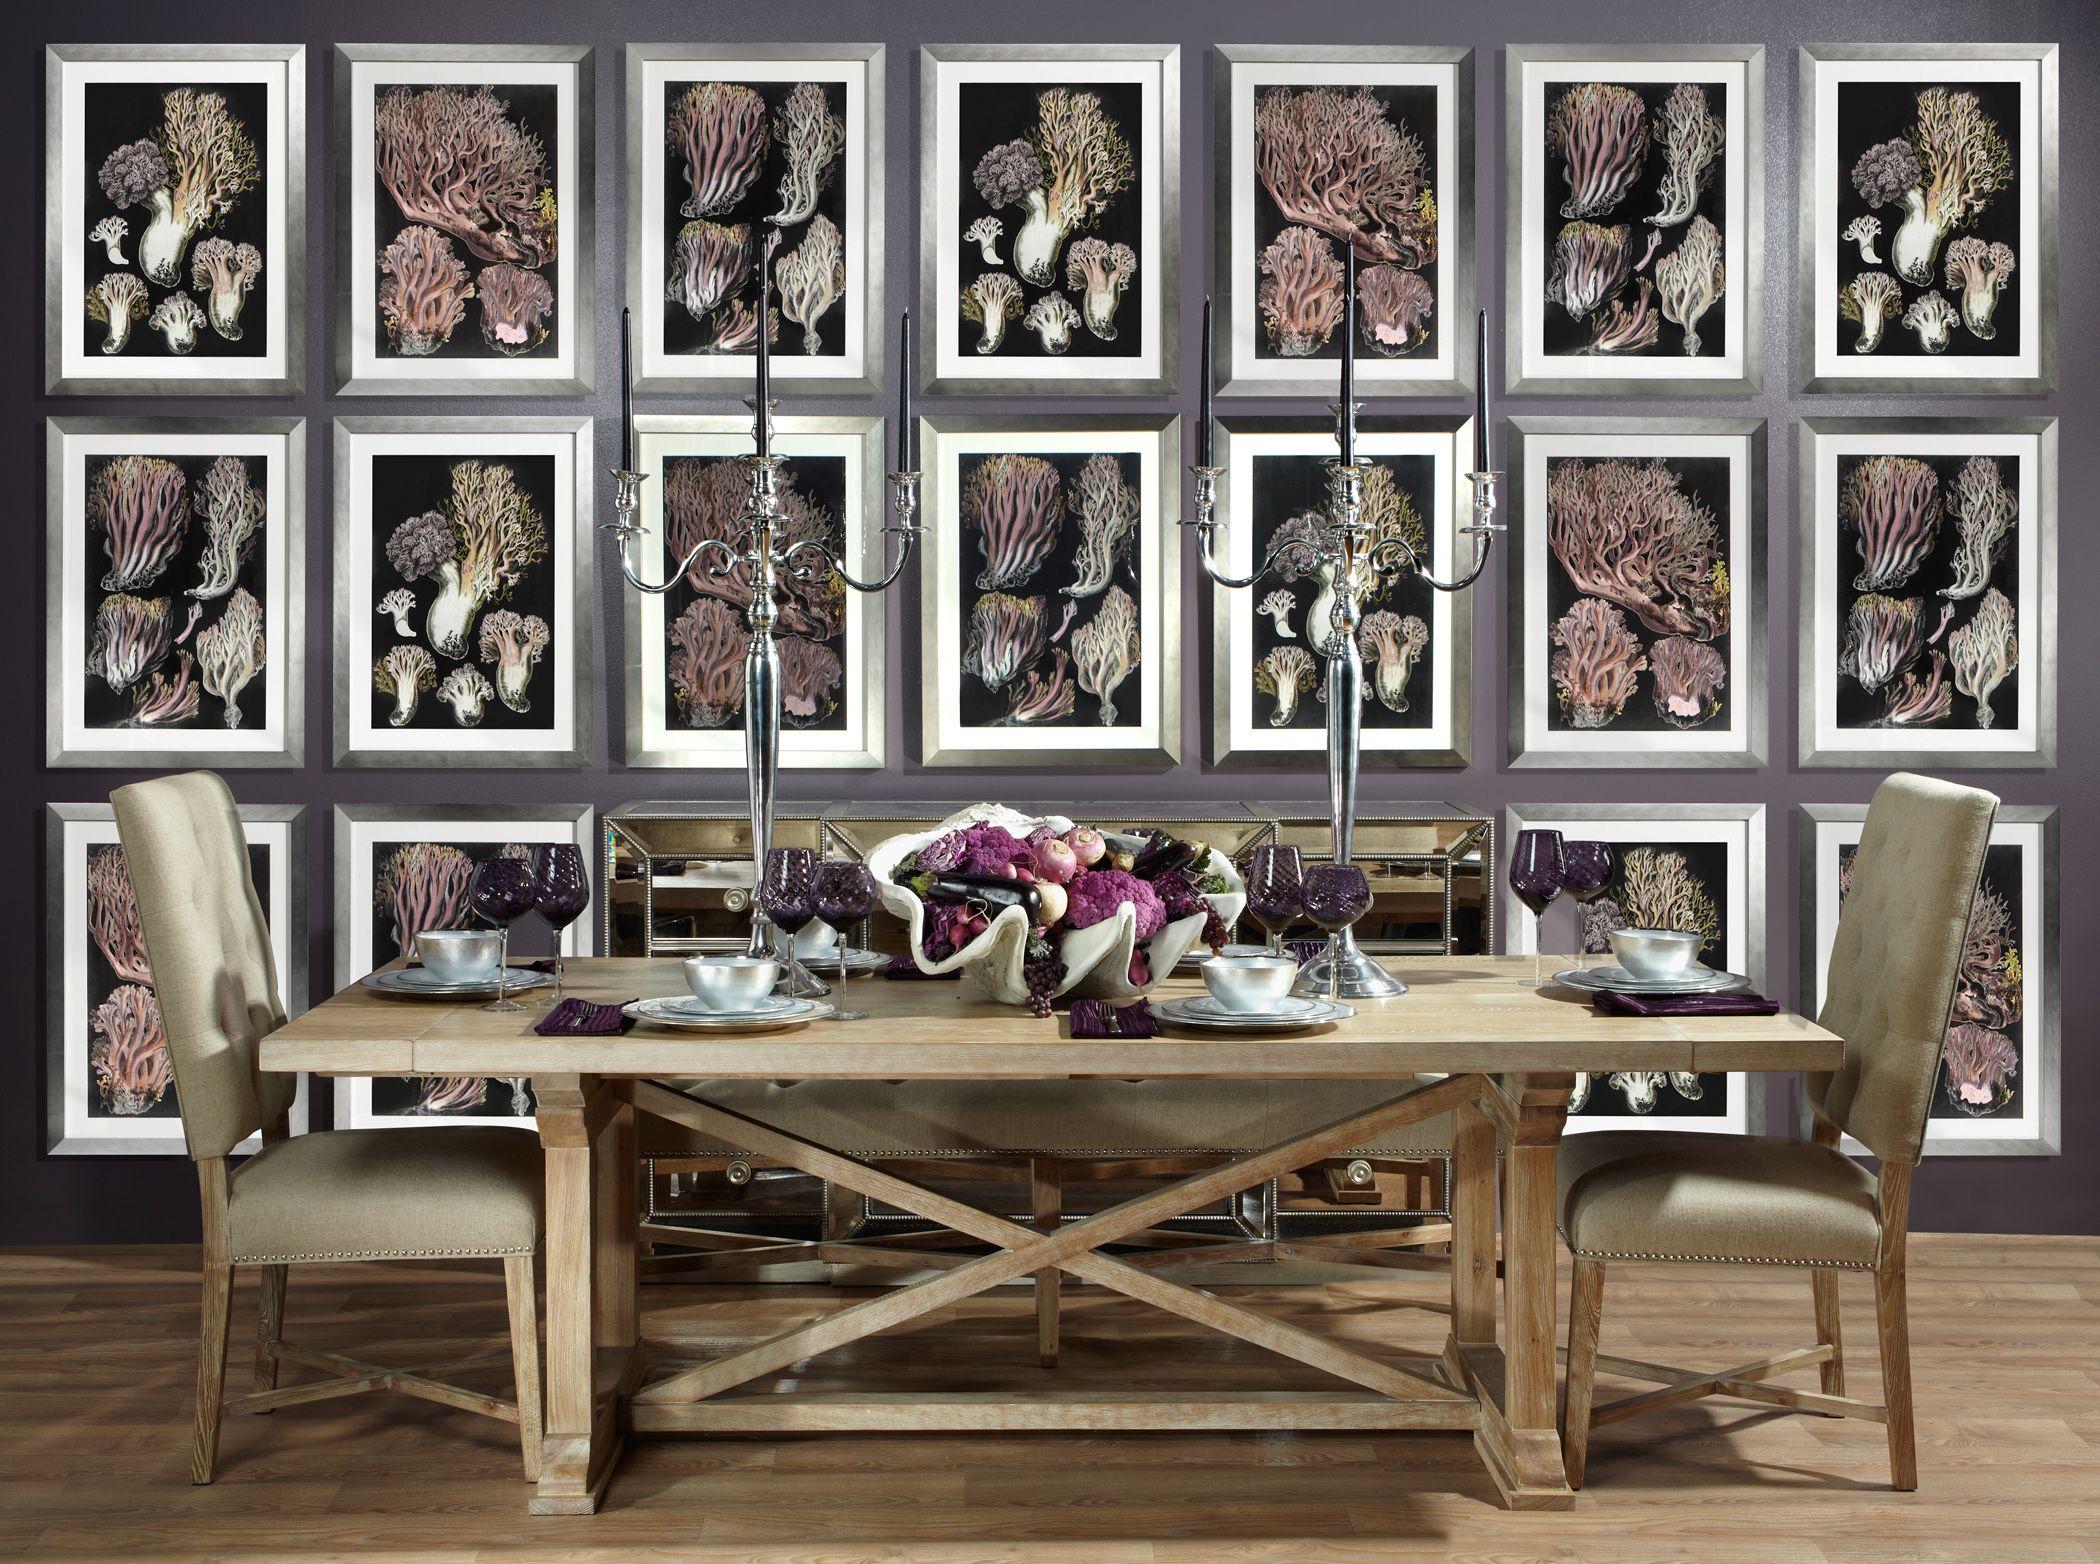 zgallerie | Don't you love Z Gallerie's aubergine coral artwork?